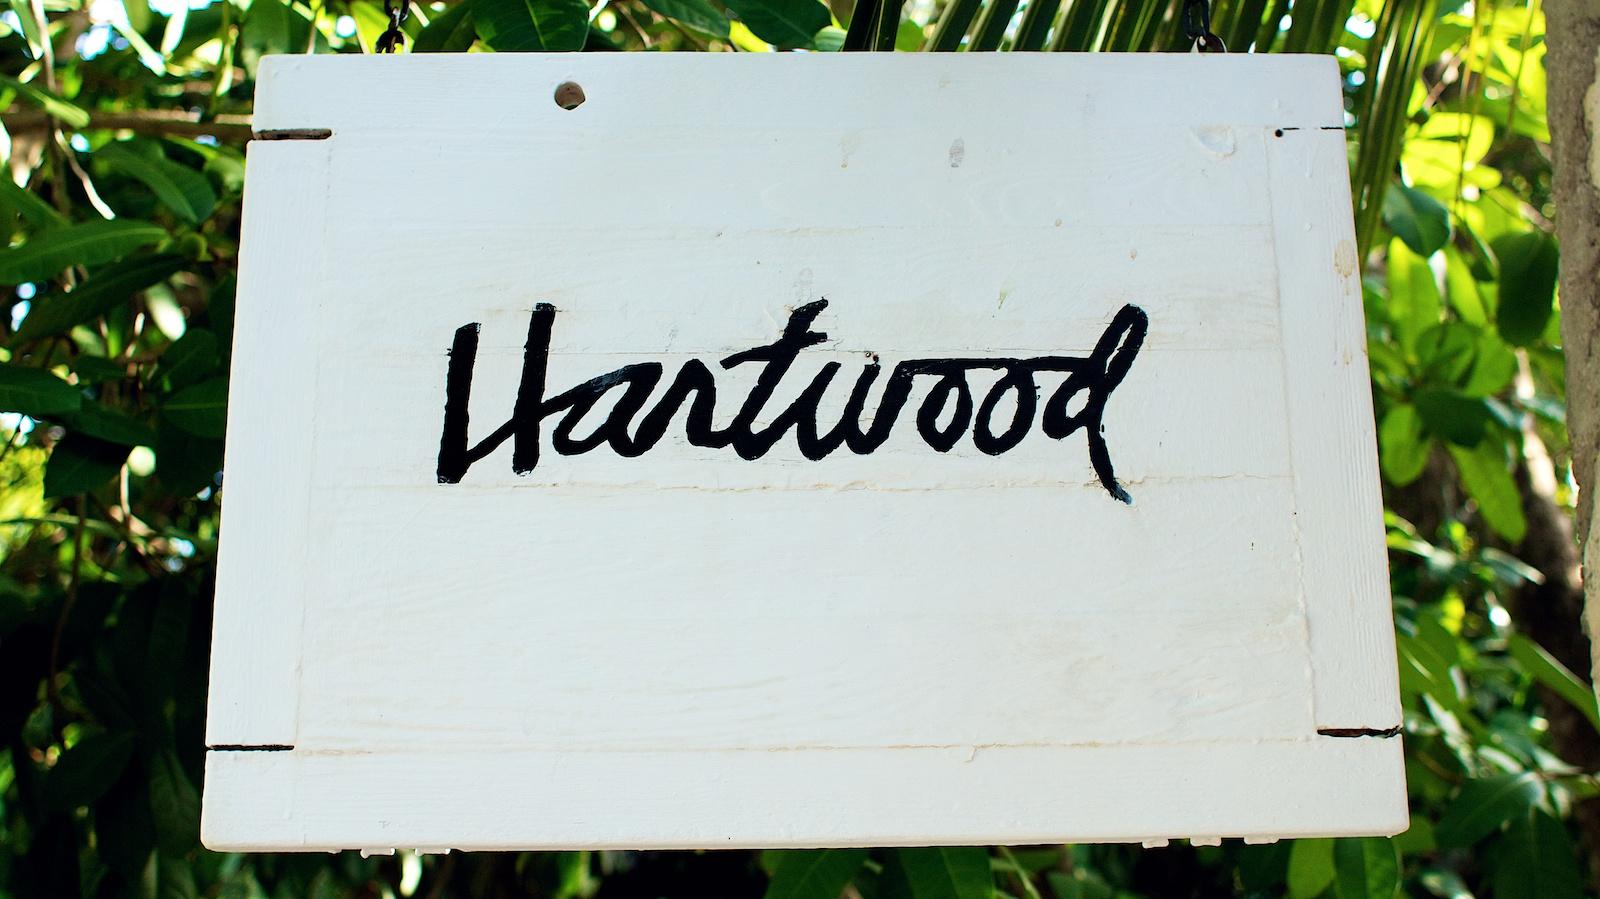 Hartwood 1600x900px 2.jpg